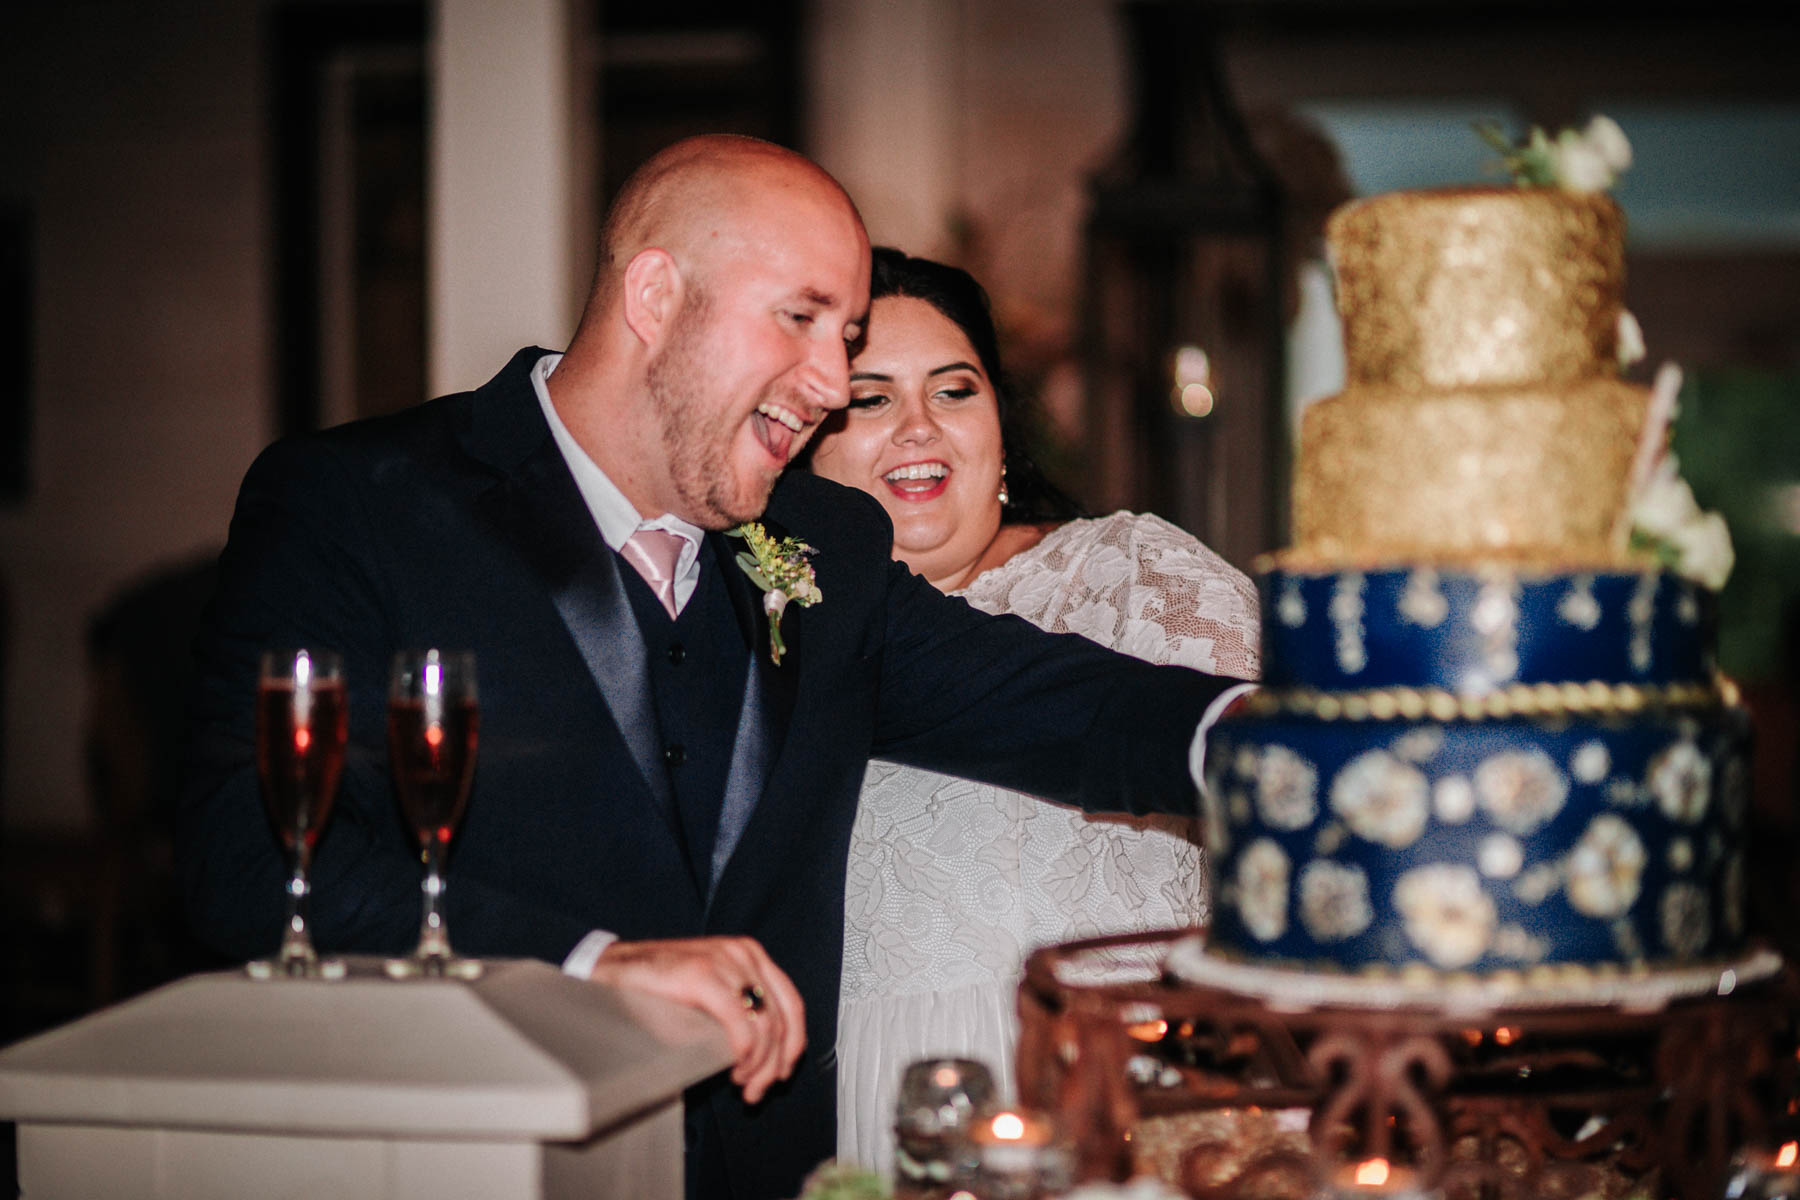 candid-wedding-picture-ideas.jpg